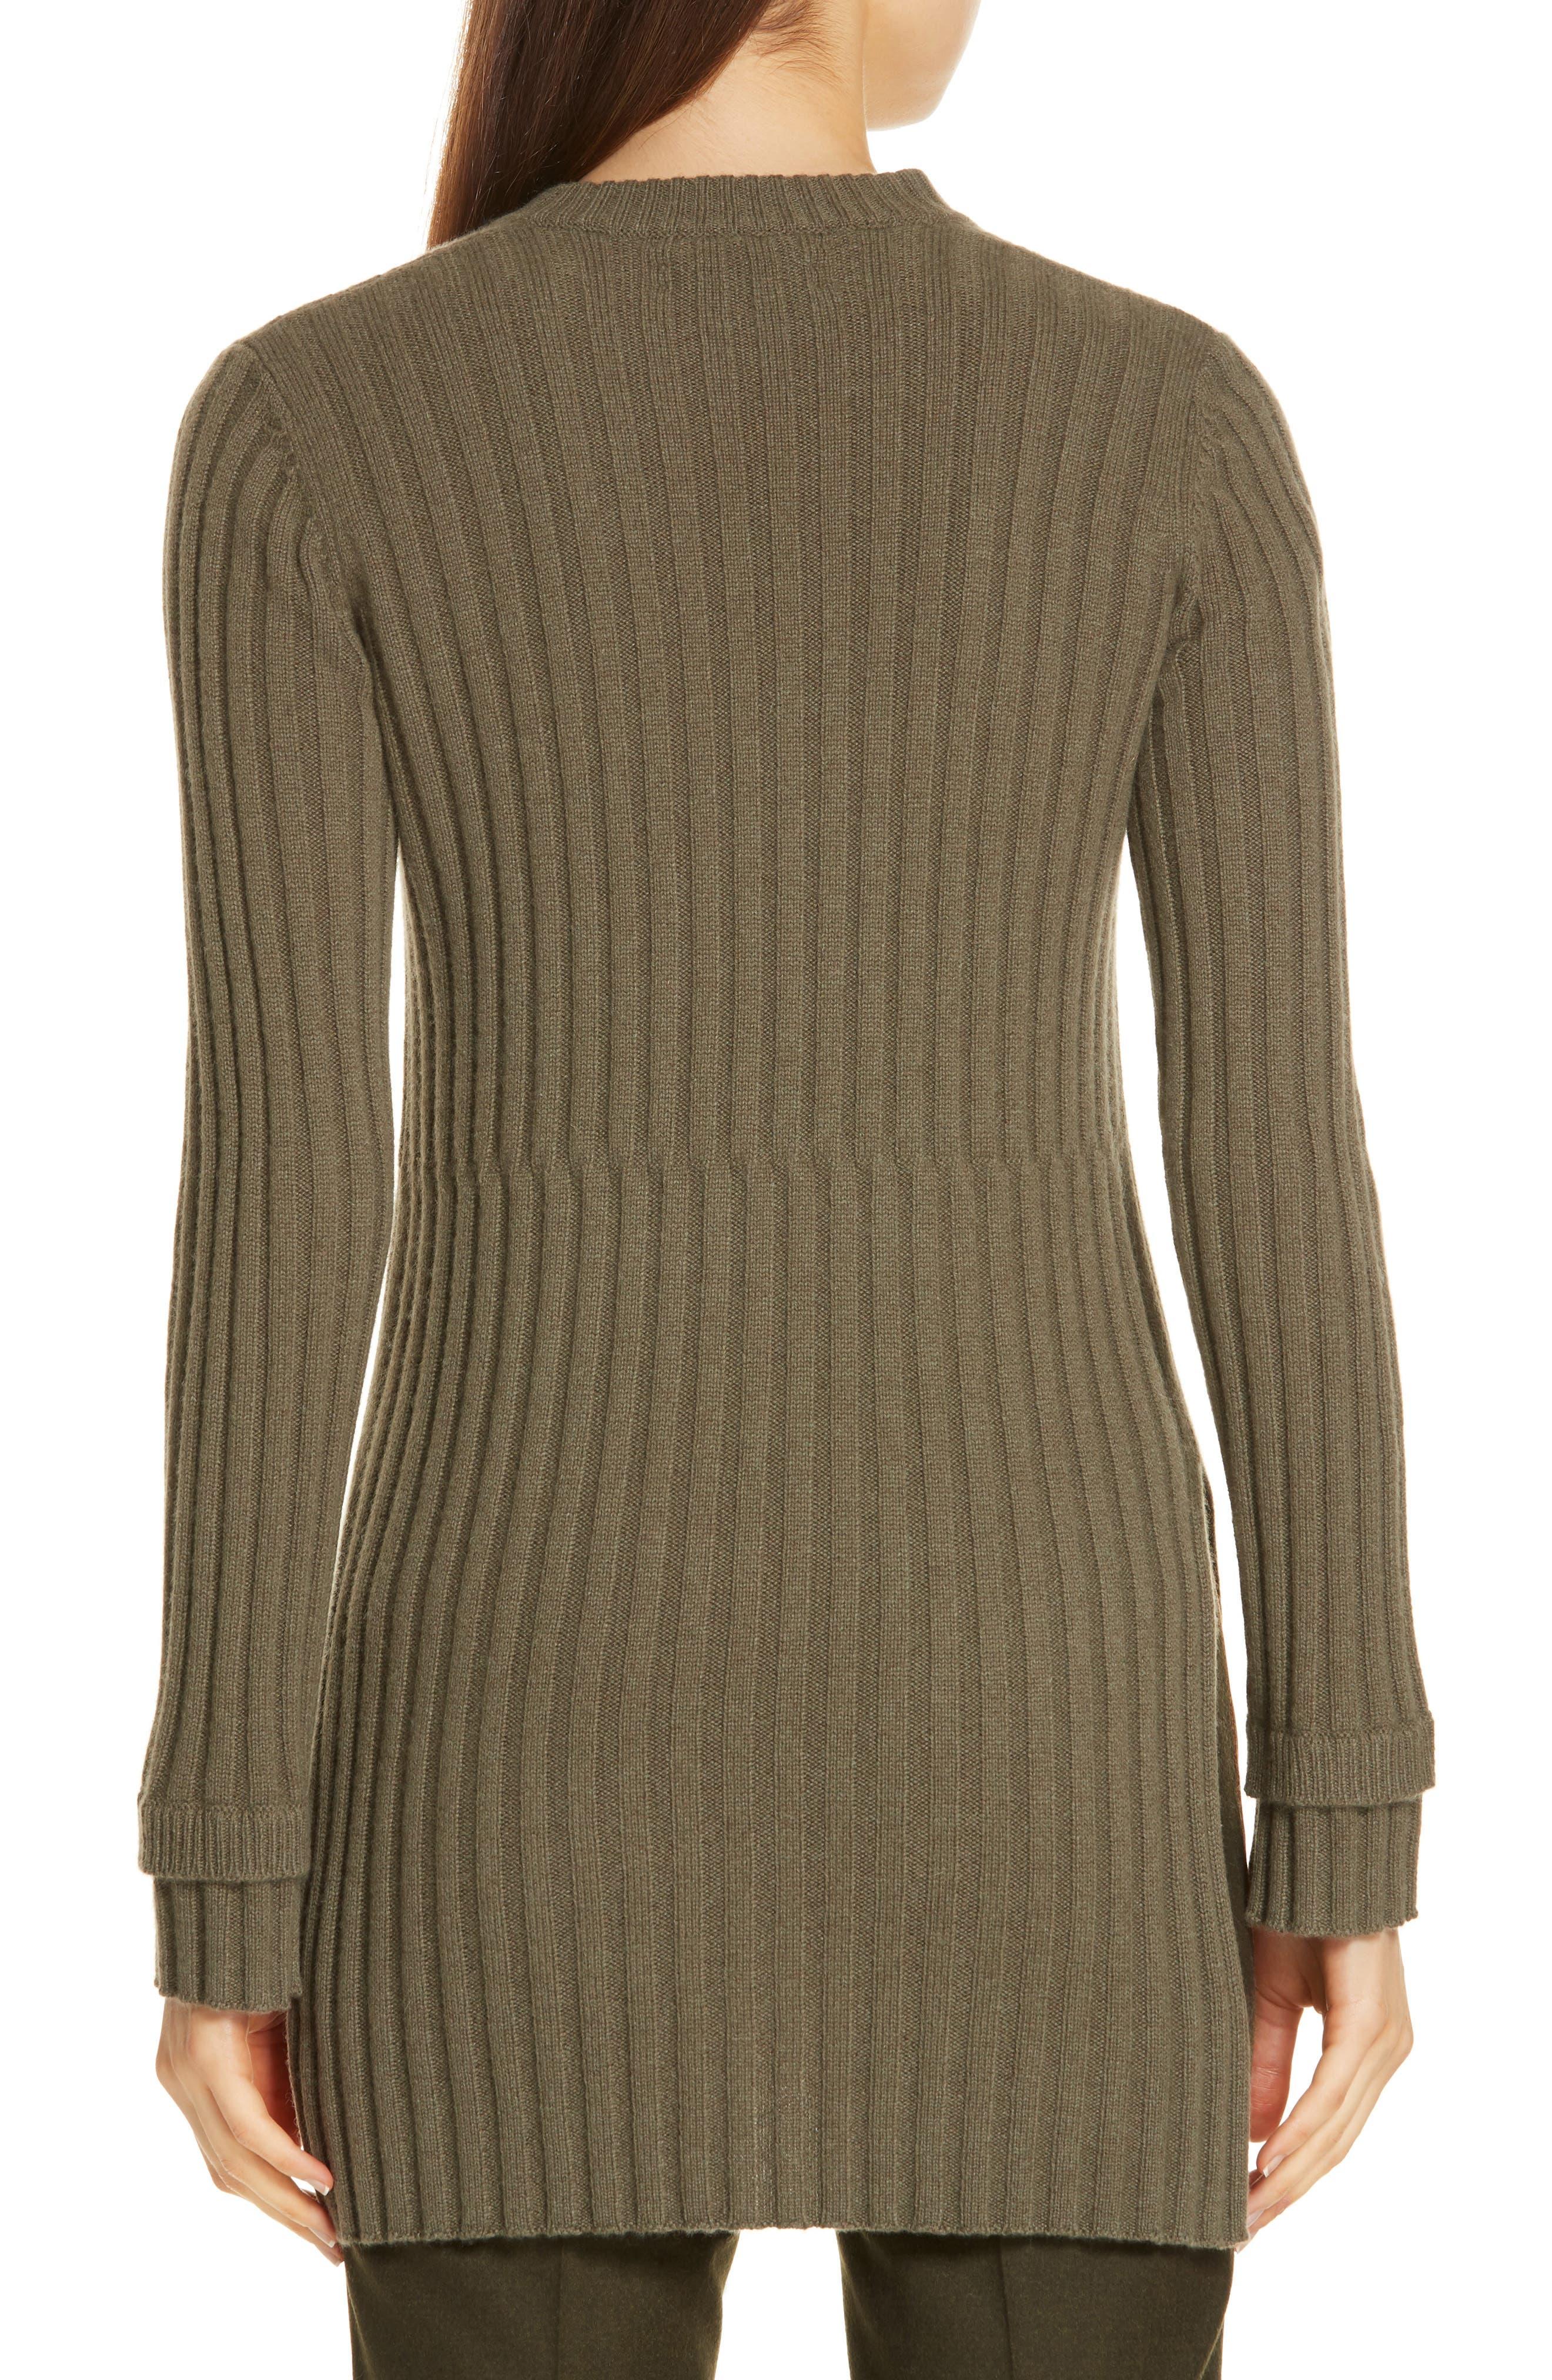 Rib Knit Cashmere Tunic,                             Alternate thumbnail 2, color,                             OLIVE IVY HEATHER